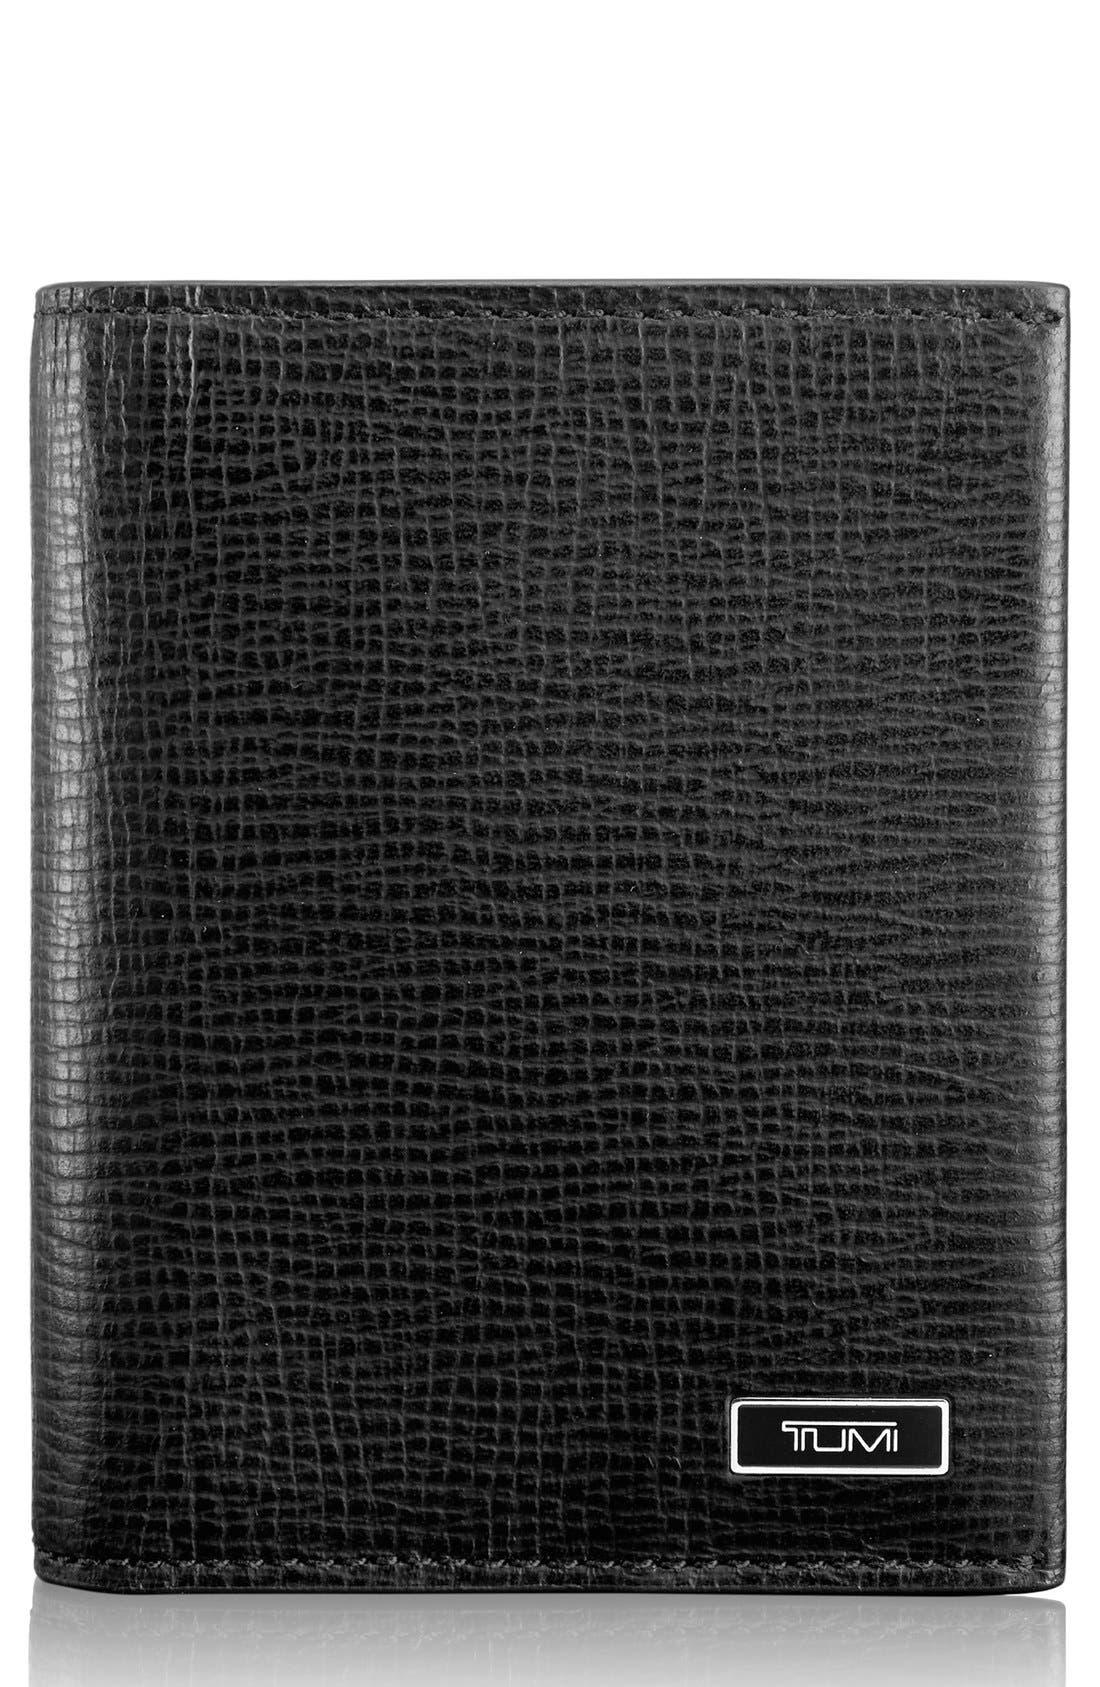 Tumi 'Monaco' Leather Card Case